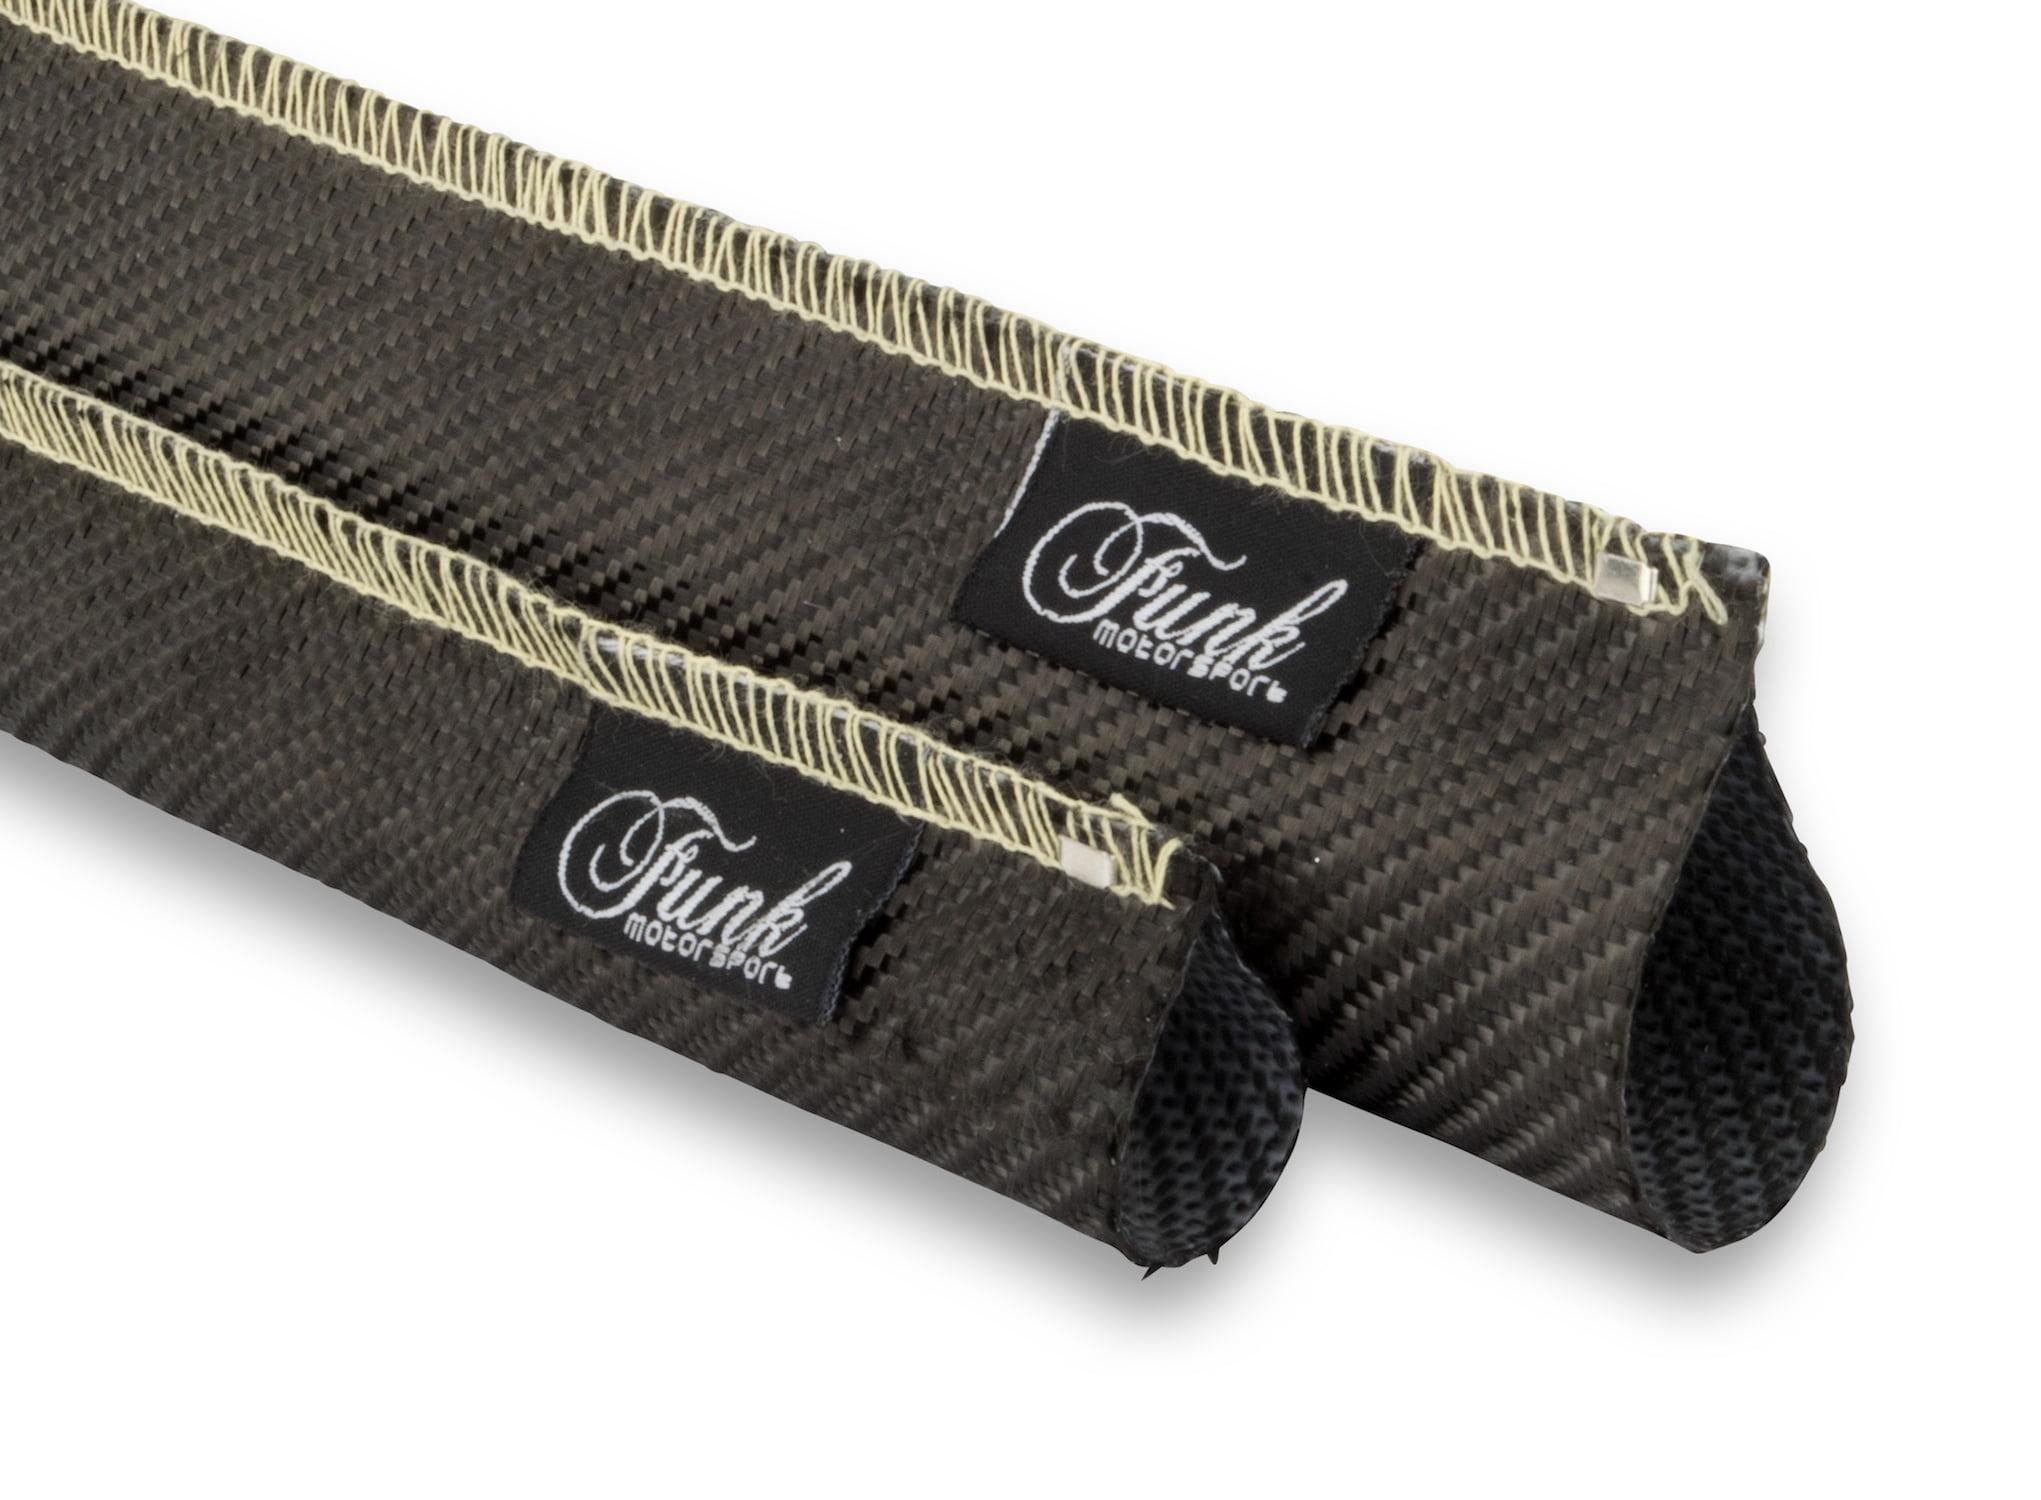 Funk Motorsport - Carbon Fibre Sleeving (Sewn) - 15⌀mm X 0.5m, FUNK-CFSWN-1505